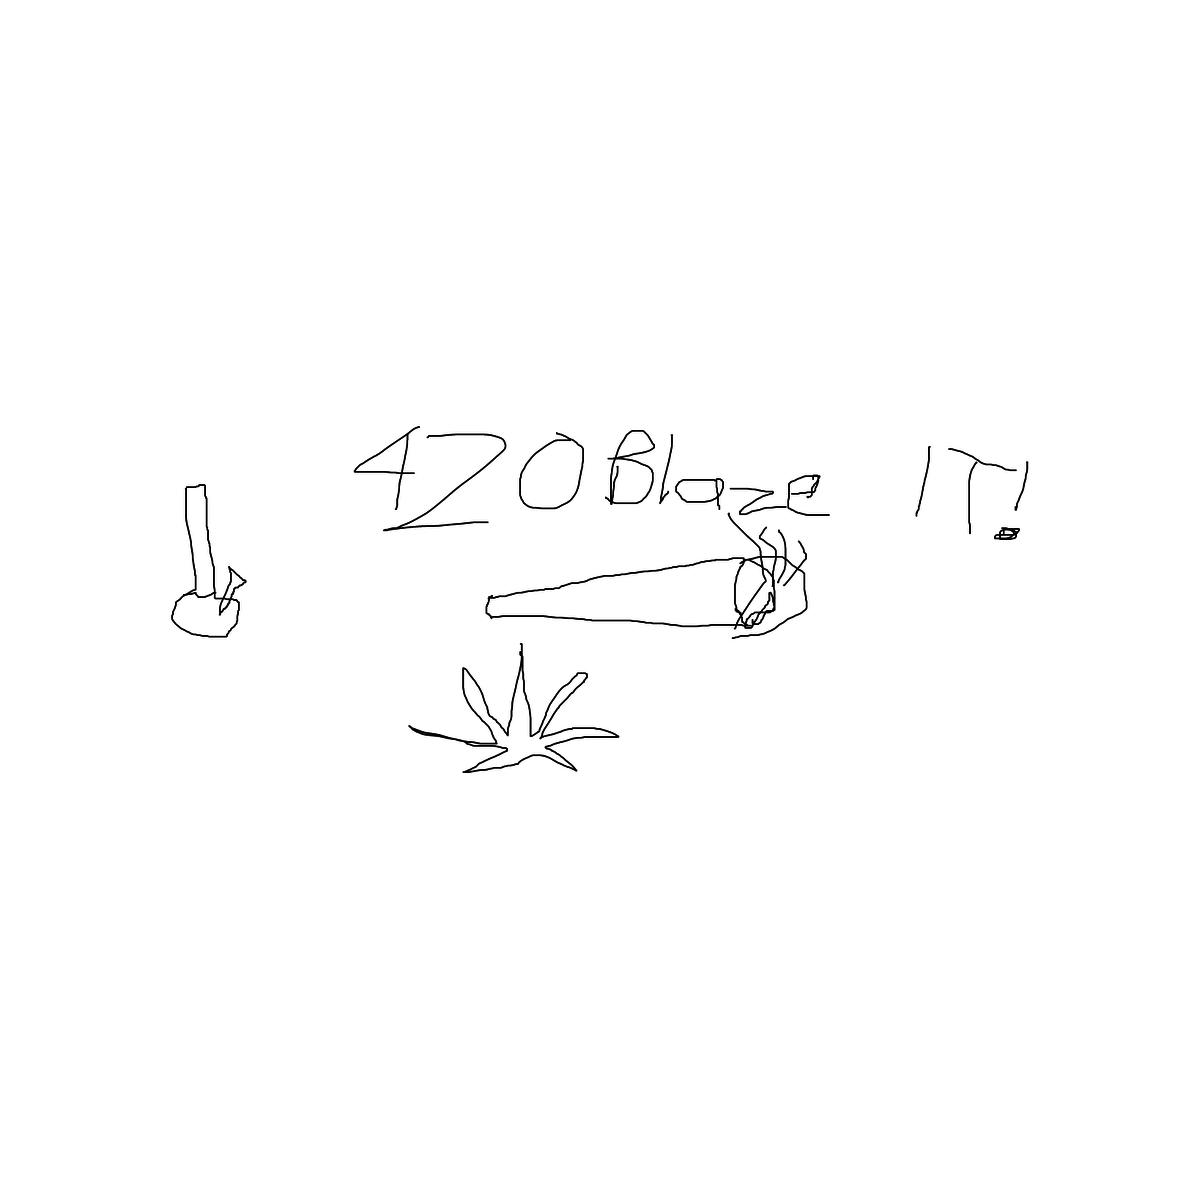 BAAAM drawing#7657 lat:46.0129966735839840lng: 7.7566070556640625